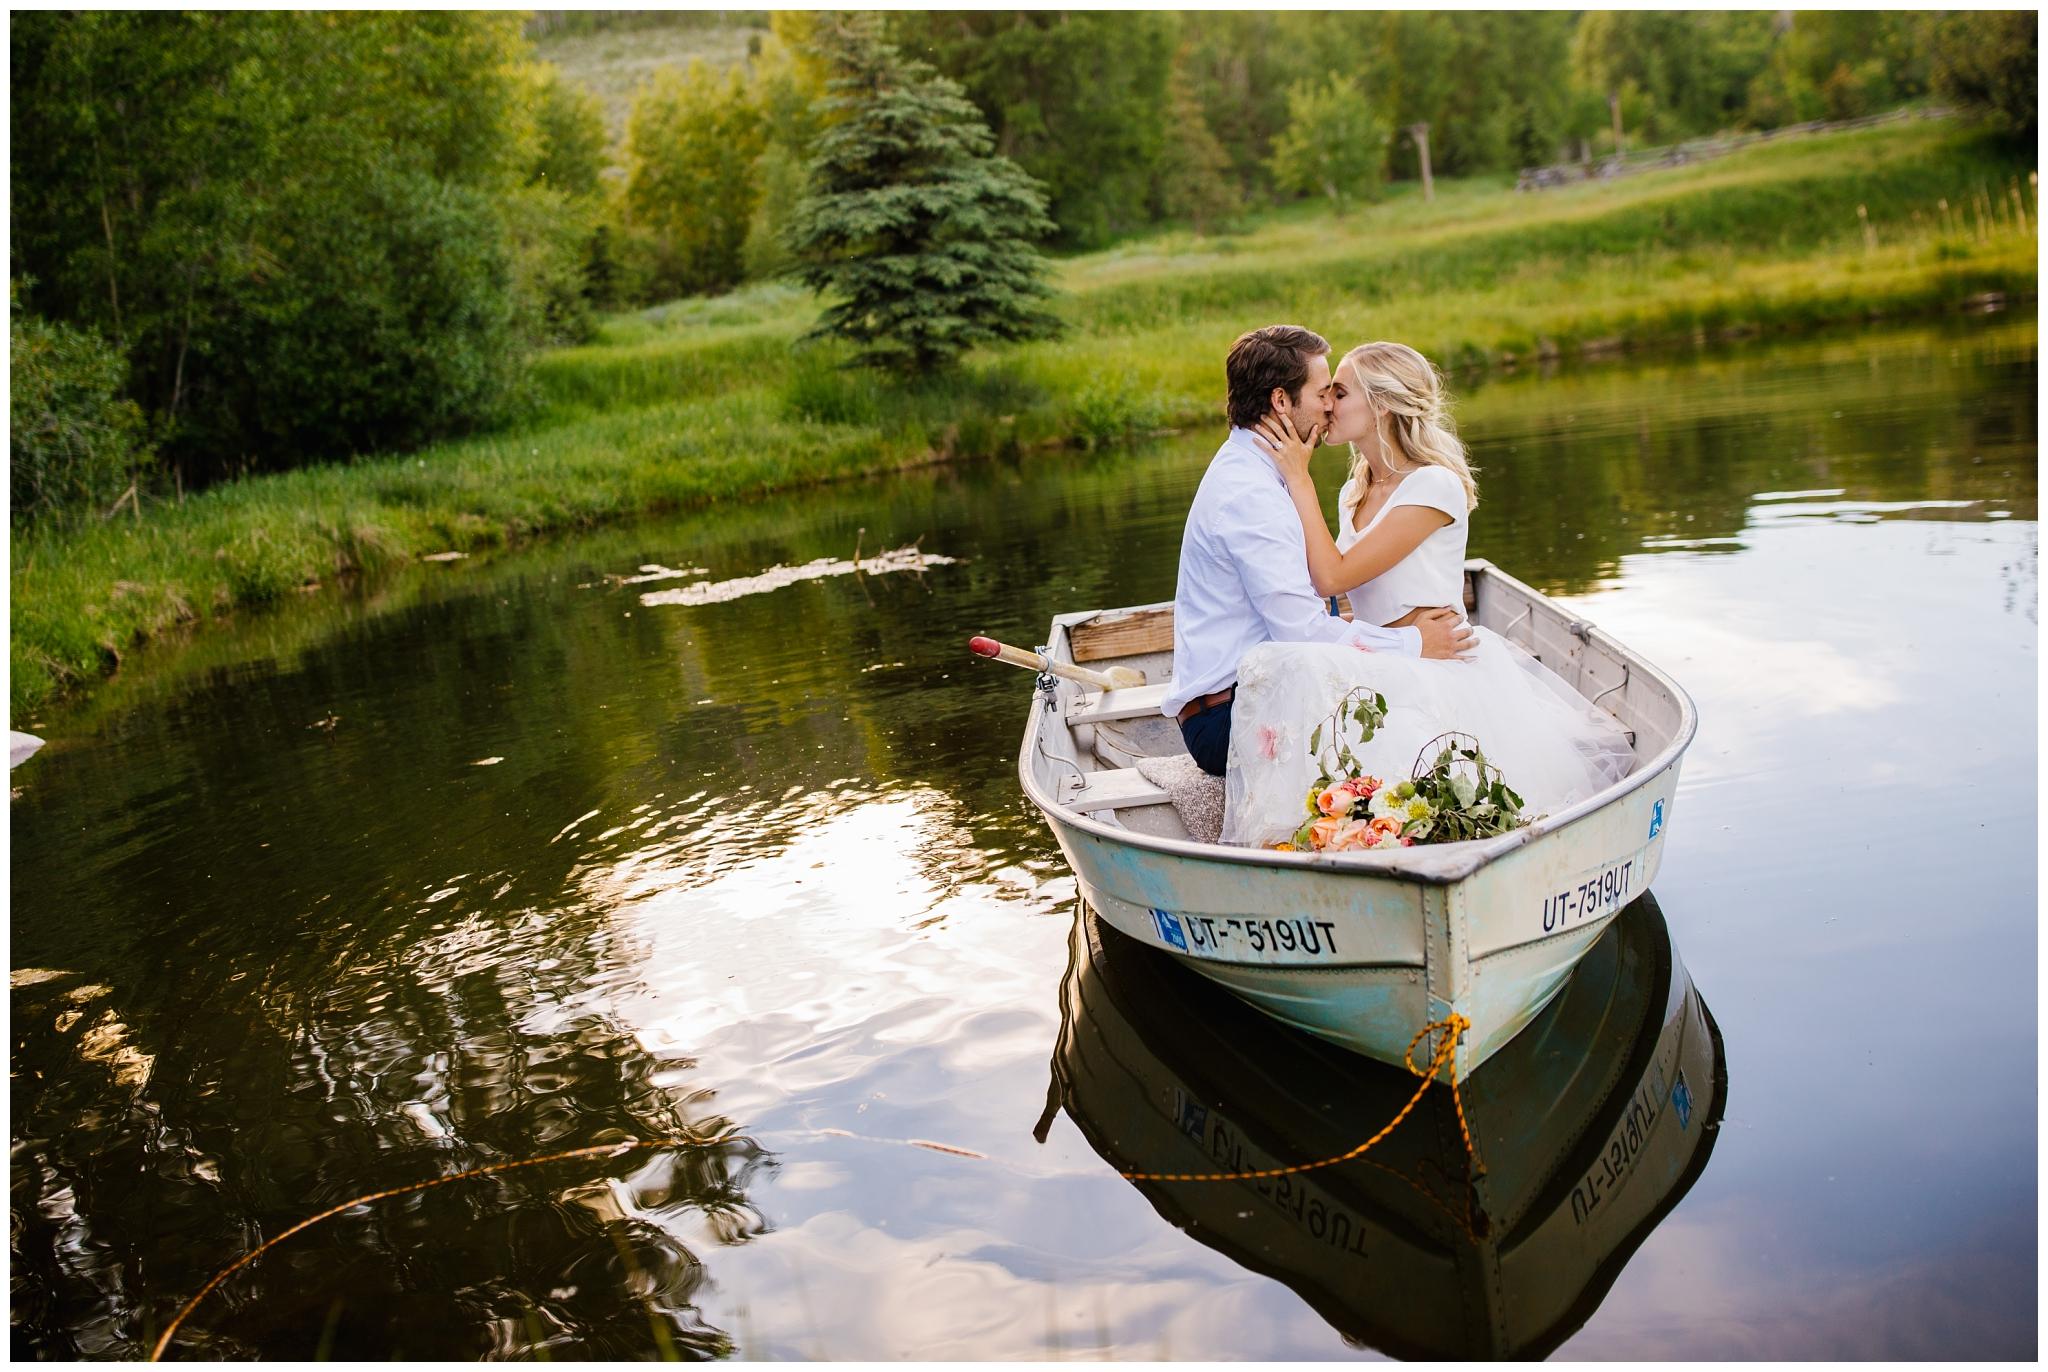 Lizzie-B-Imagery-Utah-Wedding-Photographer-Park-City-Photographer_0049.jpg